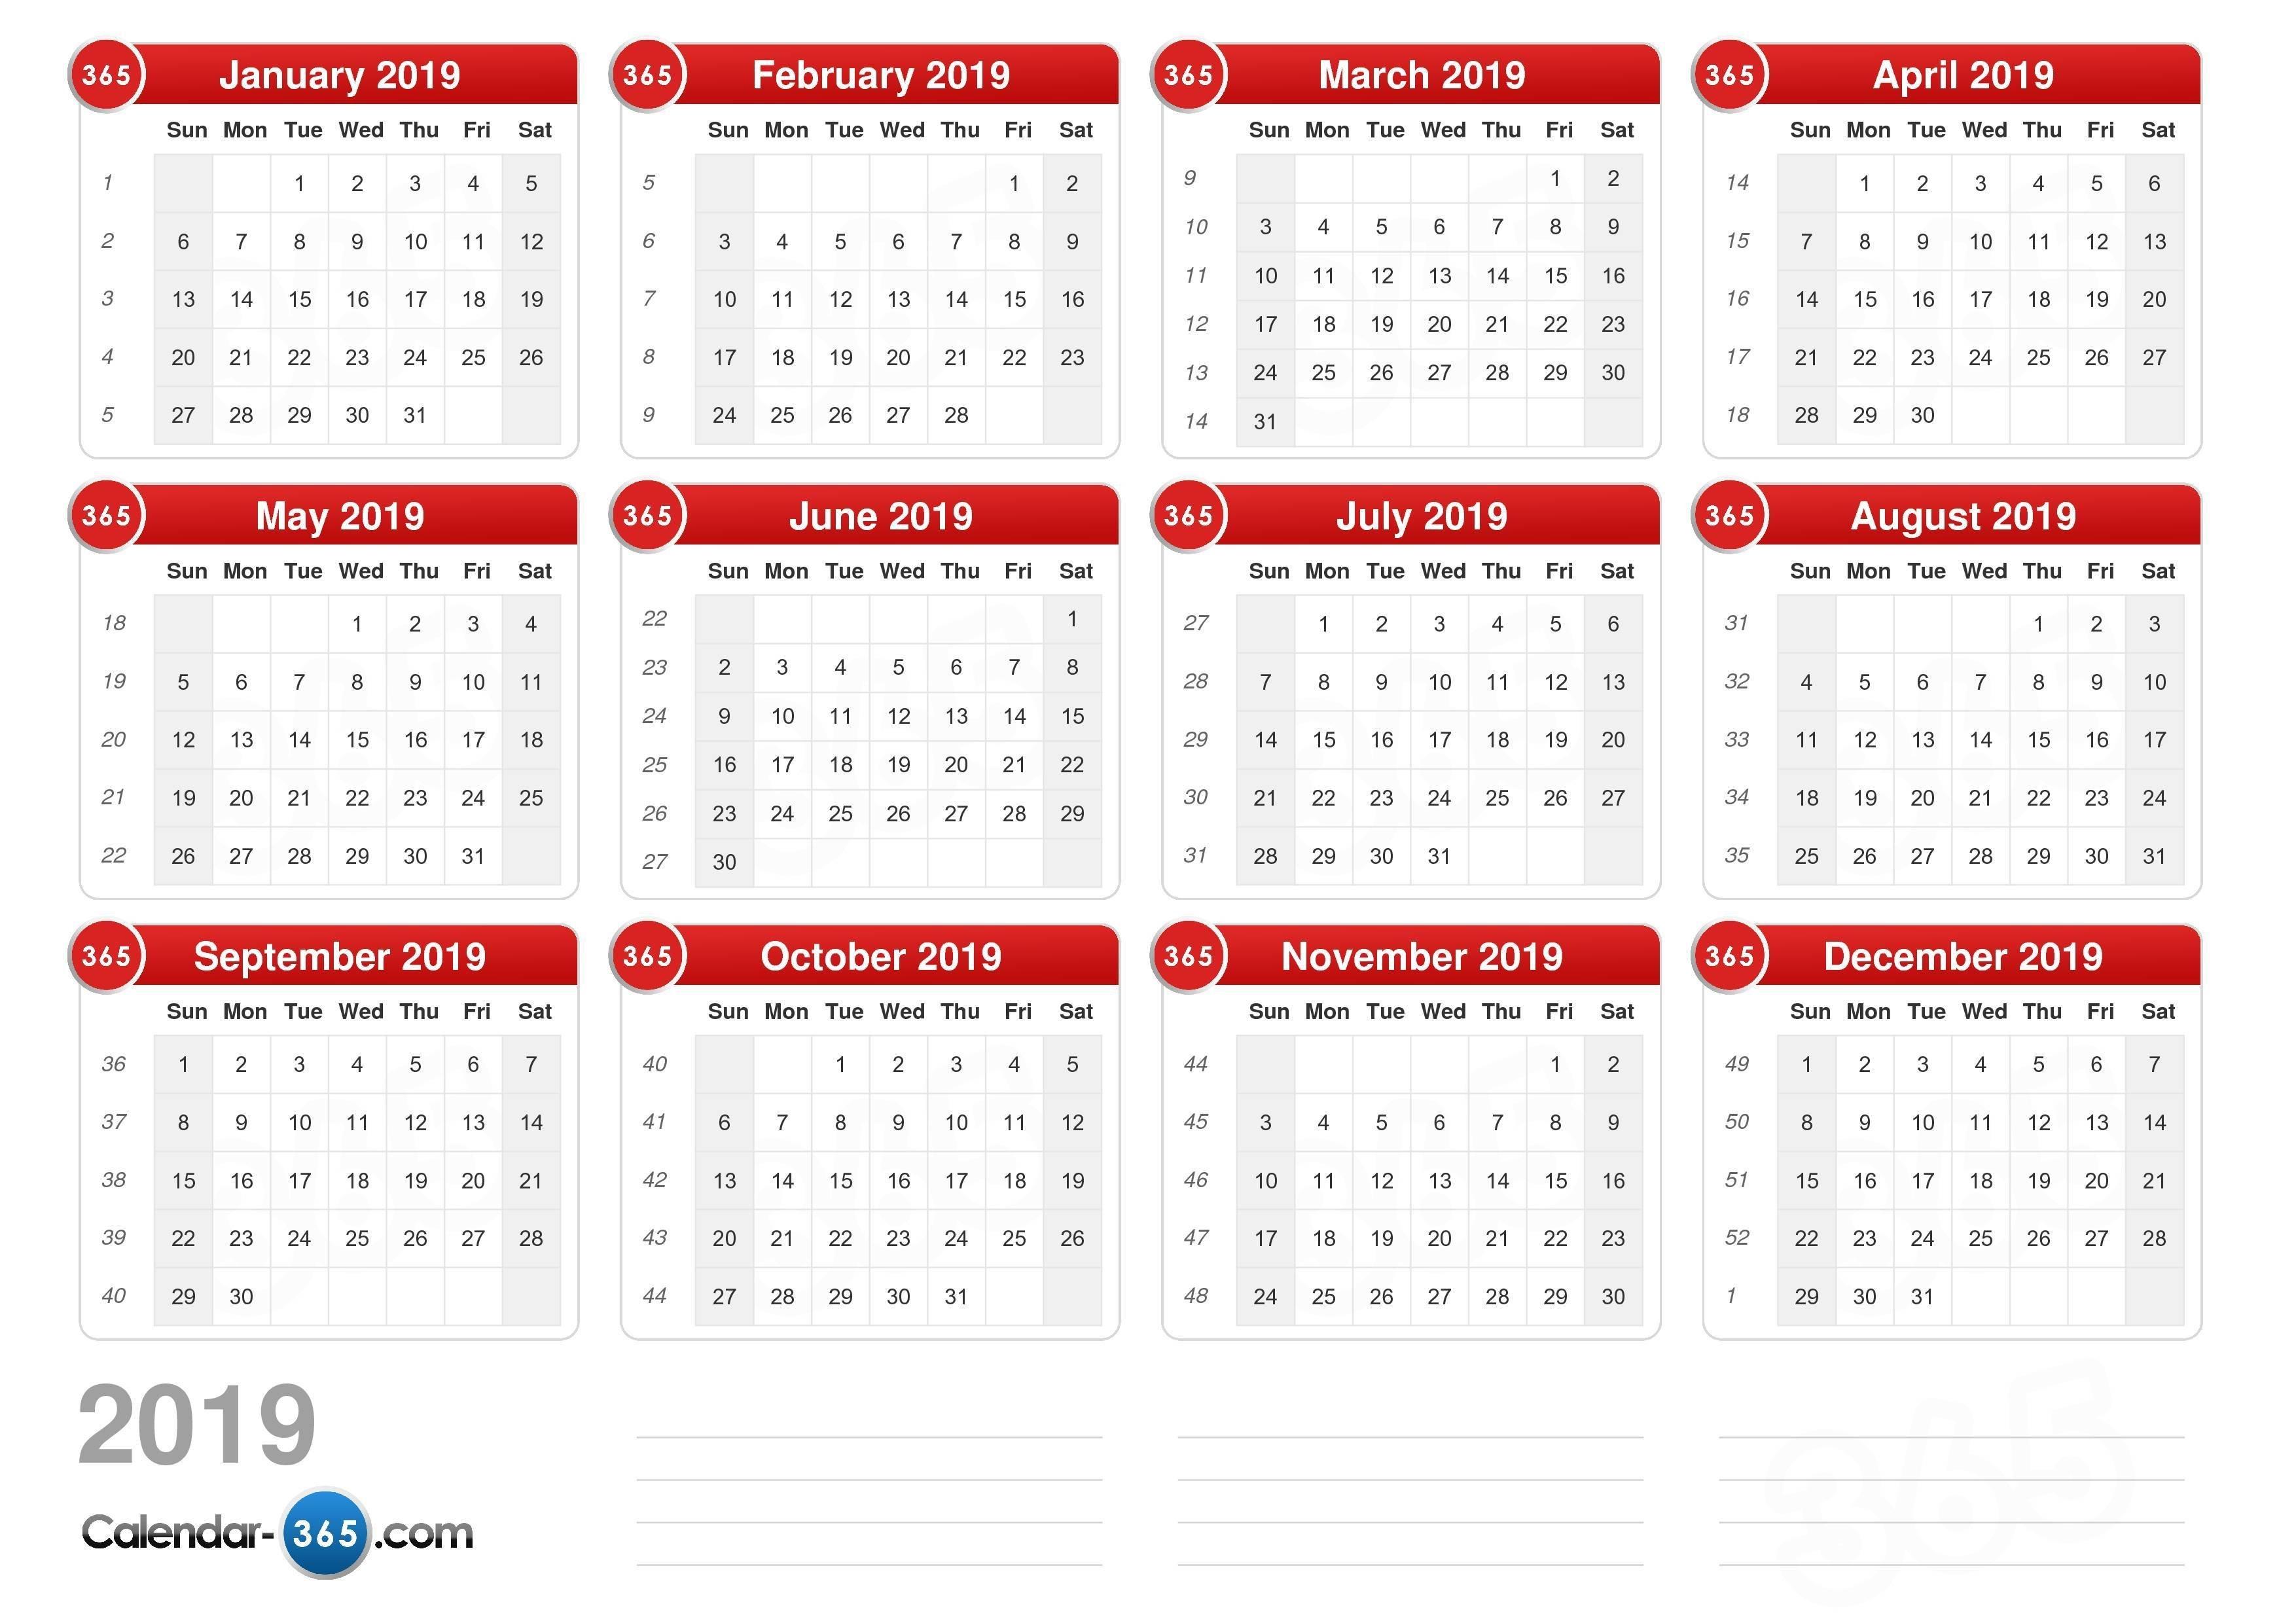 2019 Calendar Calendar 2019 Buy Online